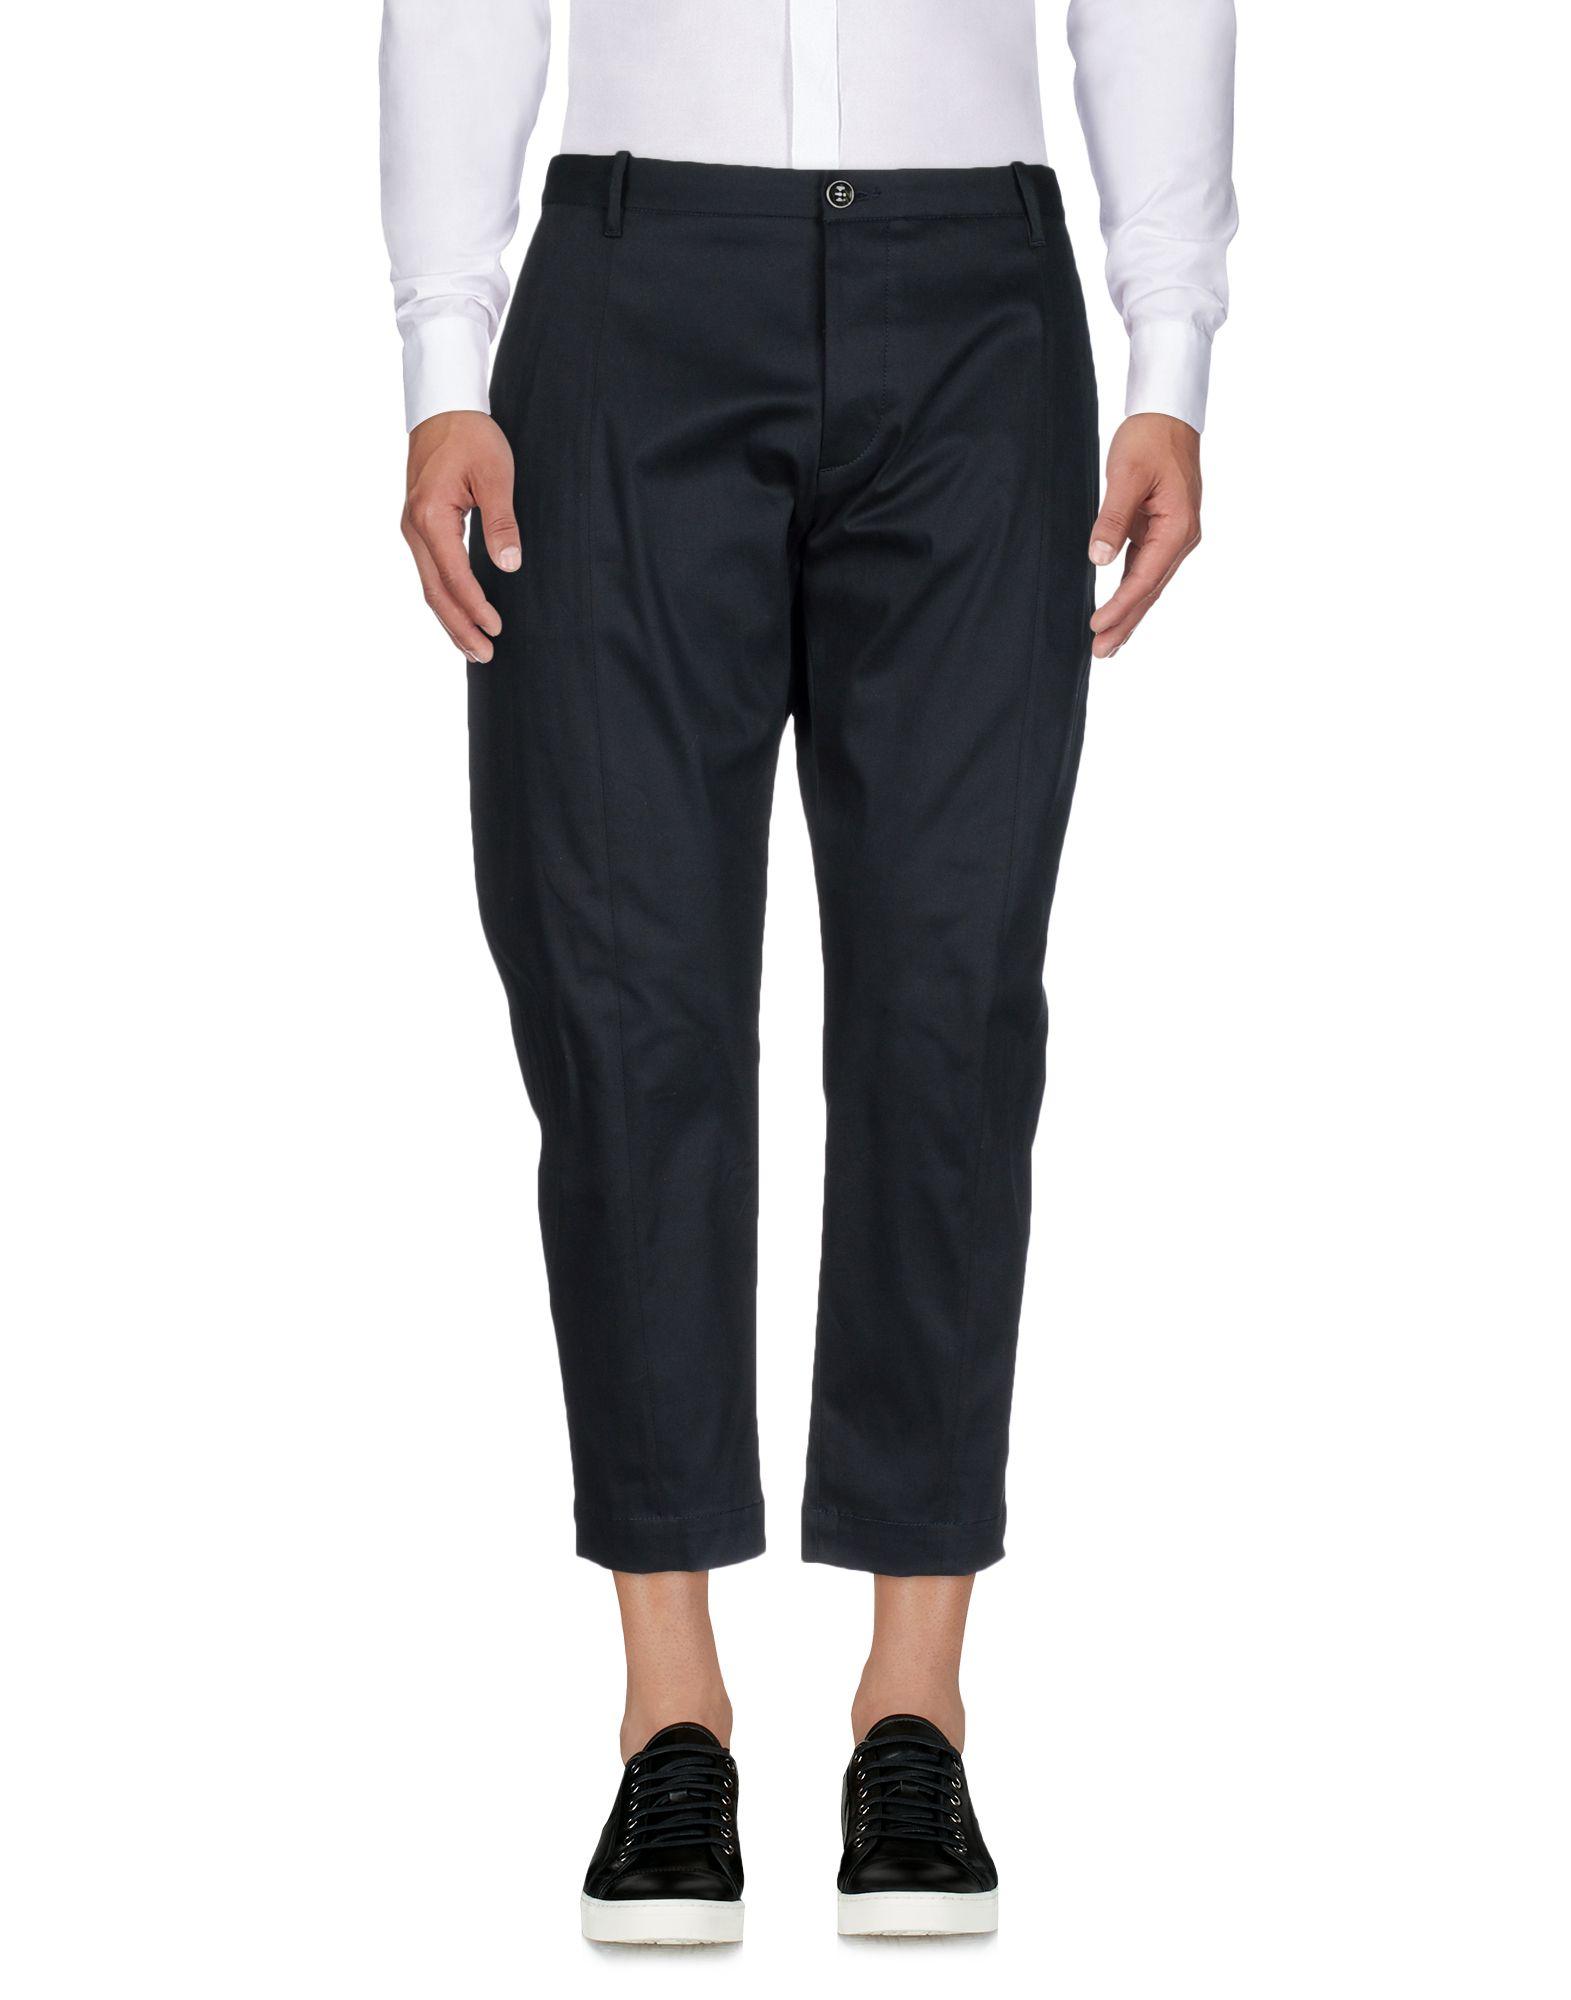 Pantalone Nine:Inthe:Morning Donna - Acquista online su